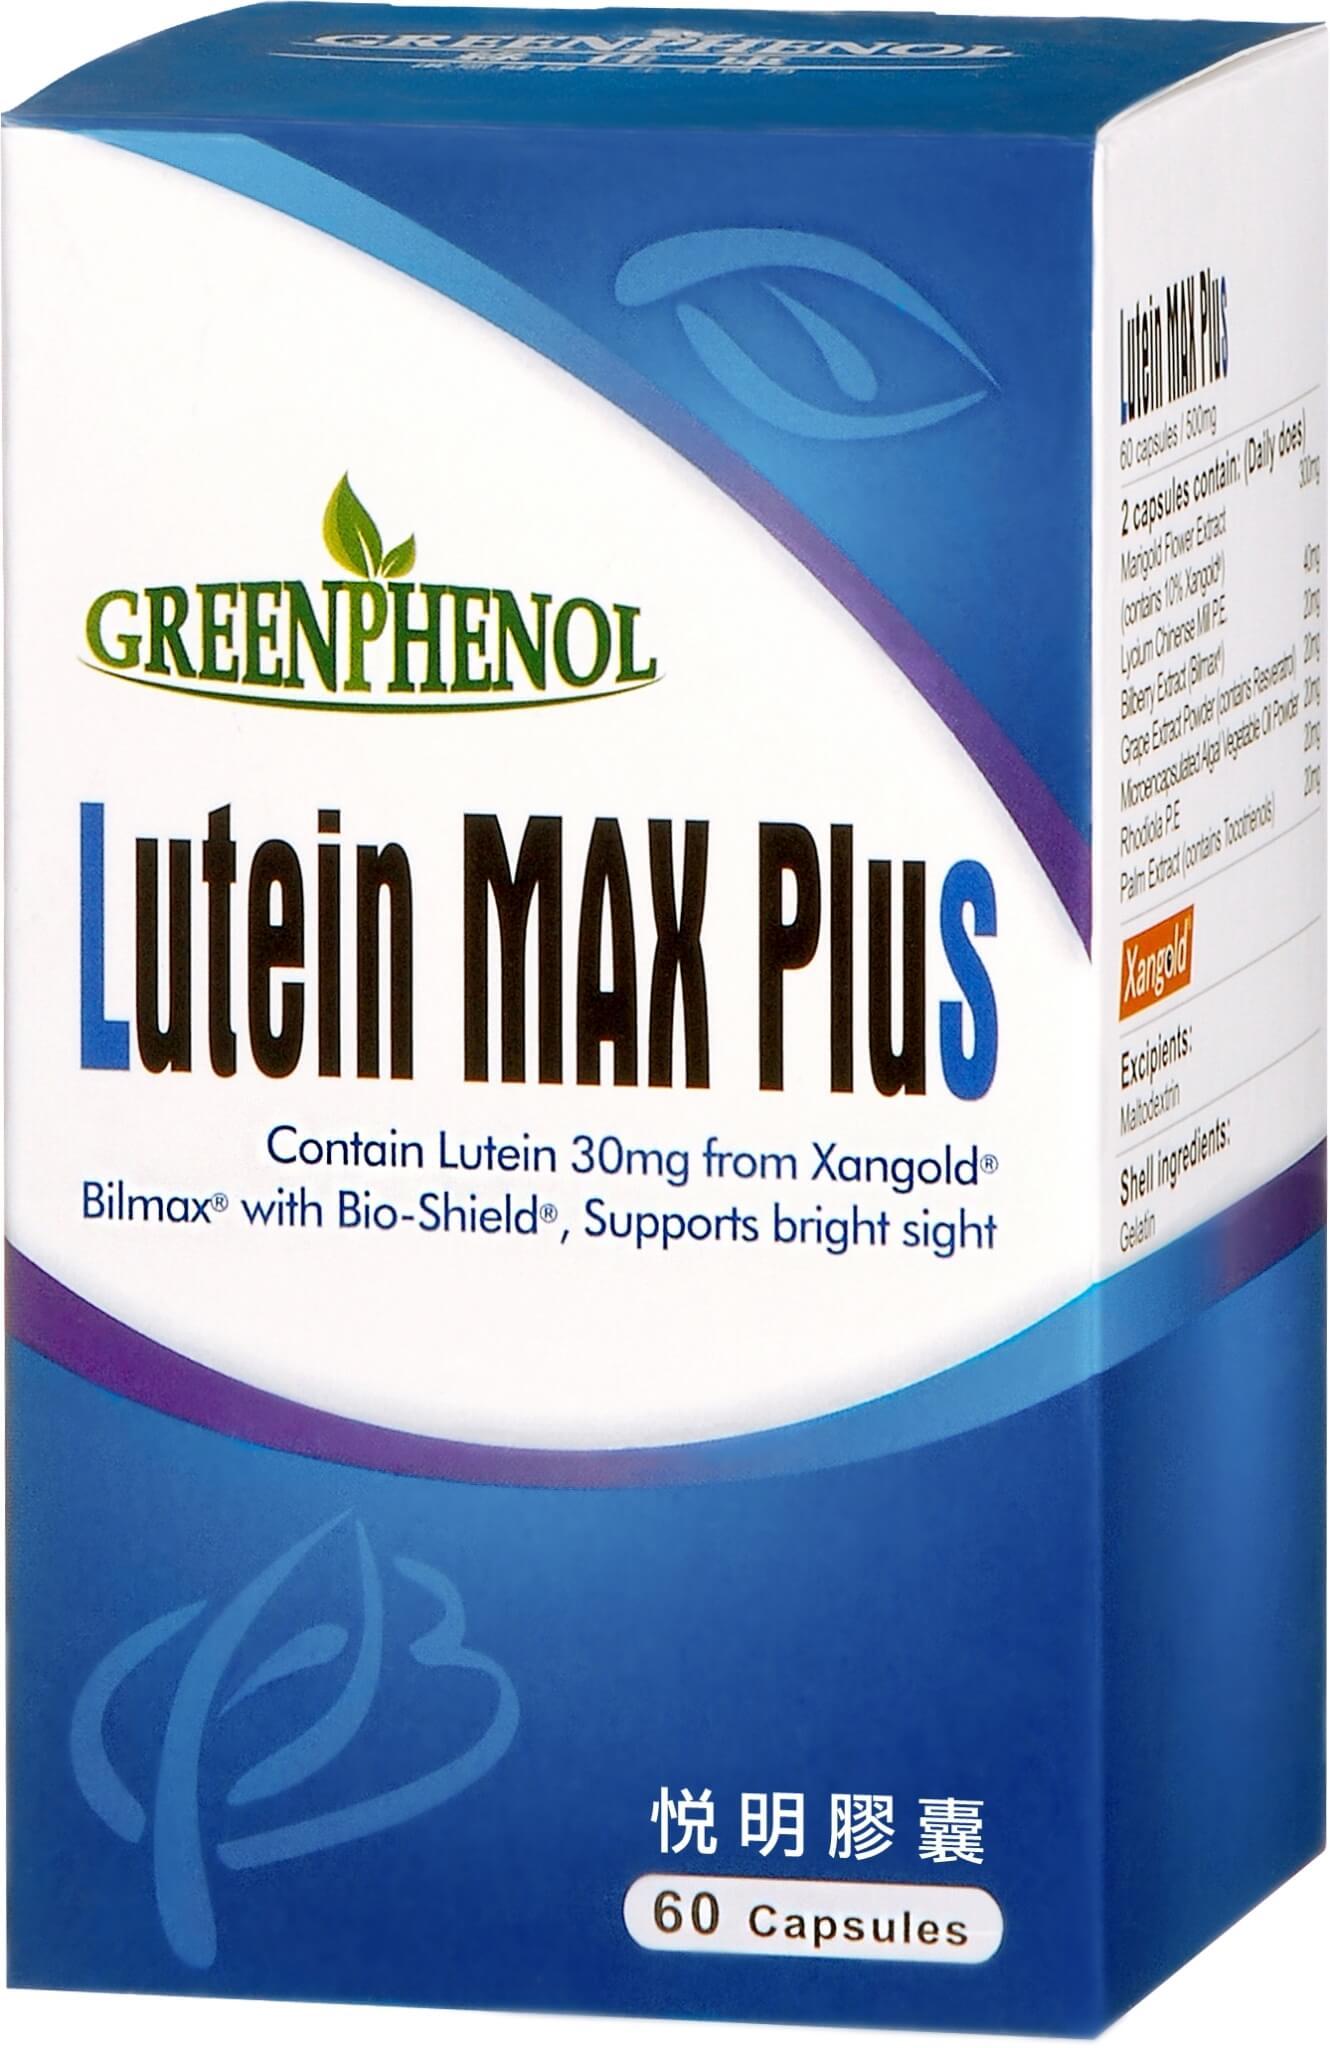 悅明複方 Lutein MAX Plus